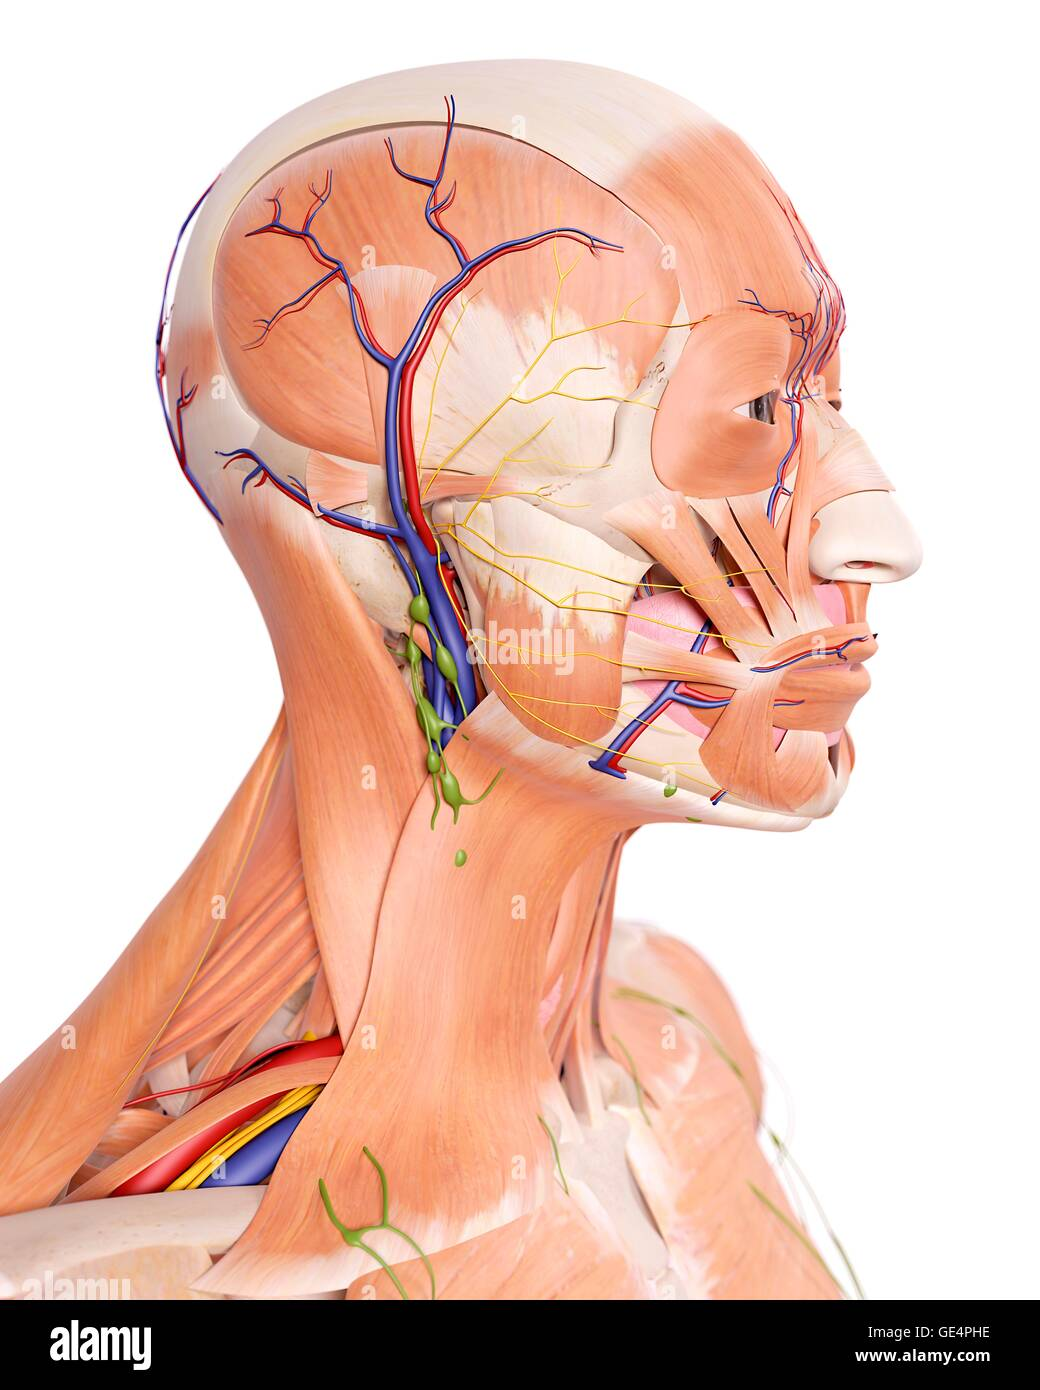 Anatomie Kopf, Abbildung Stockfoto, Bild: 111972938 - Alamy